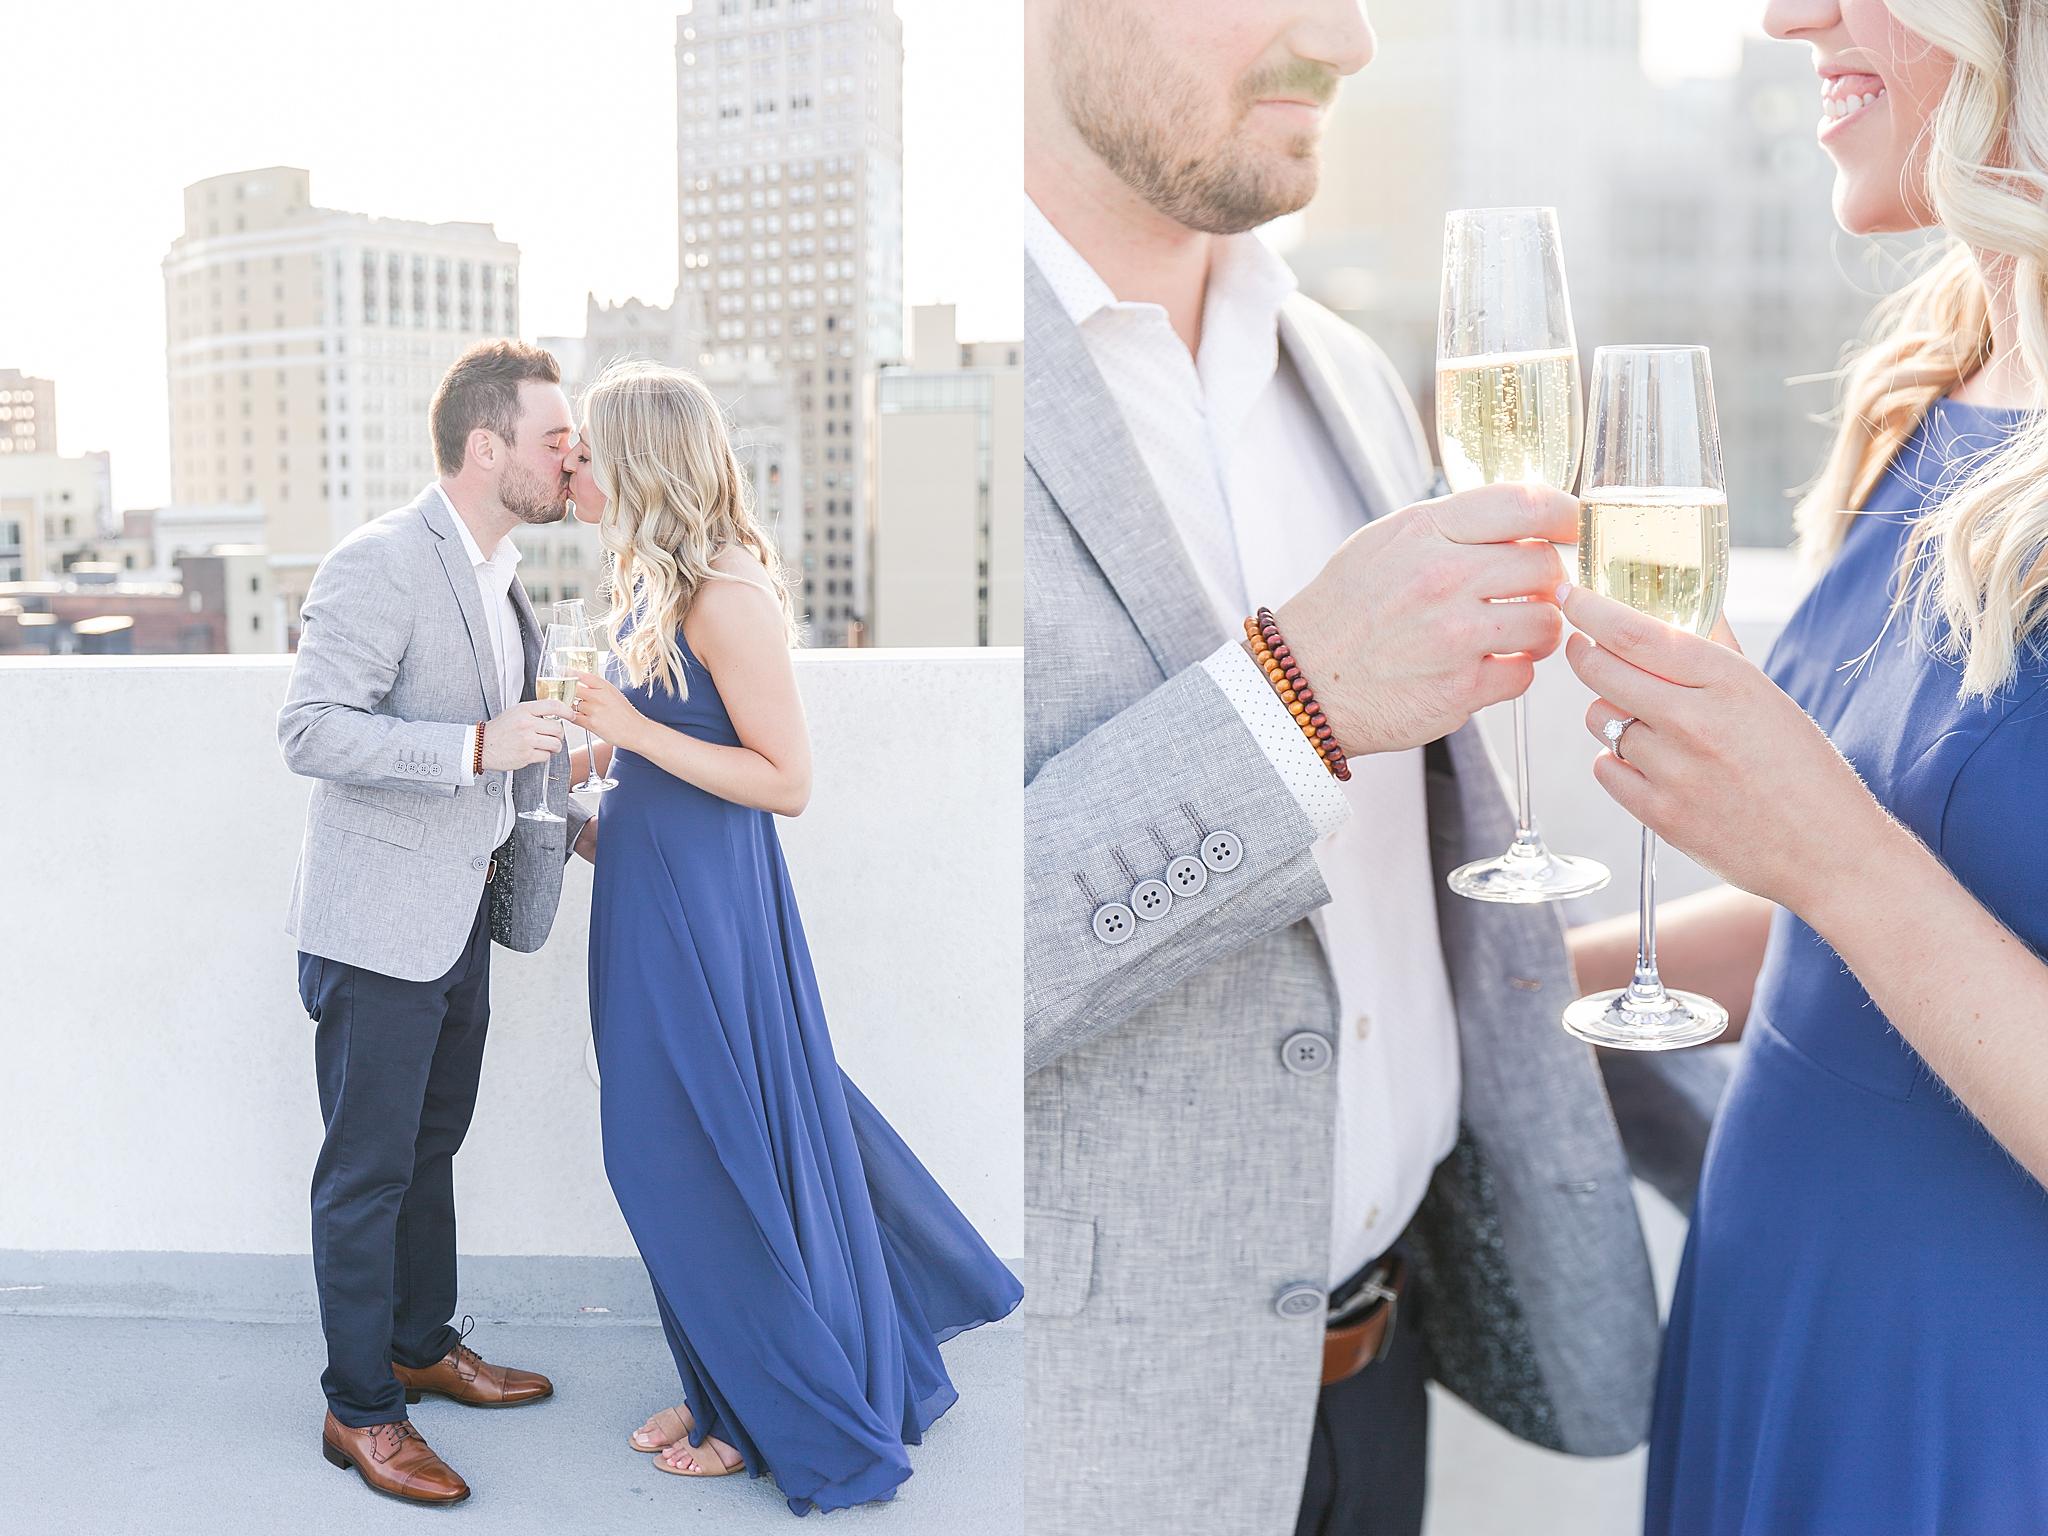 detroit-wedding-photographer-downtown-detroit-belle-isle-engagement-photos-sarah-eric-by-courtney-carolyn-photography_0010.jpg